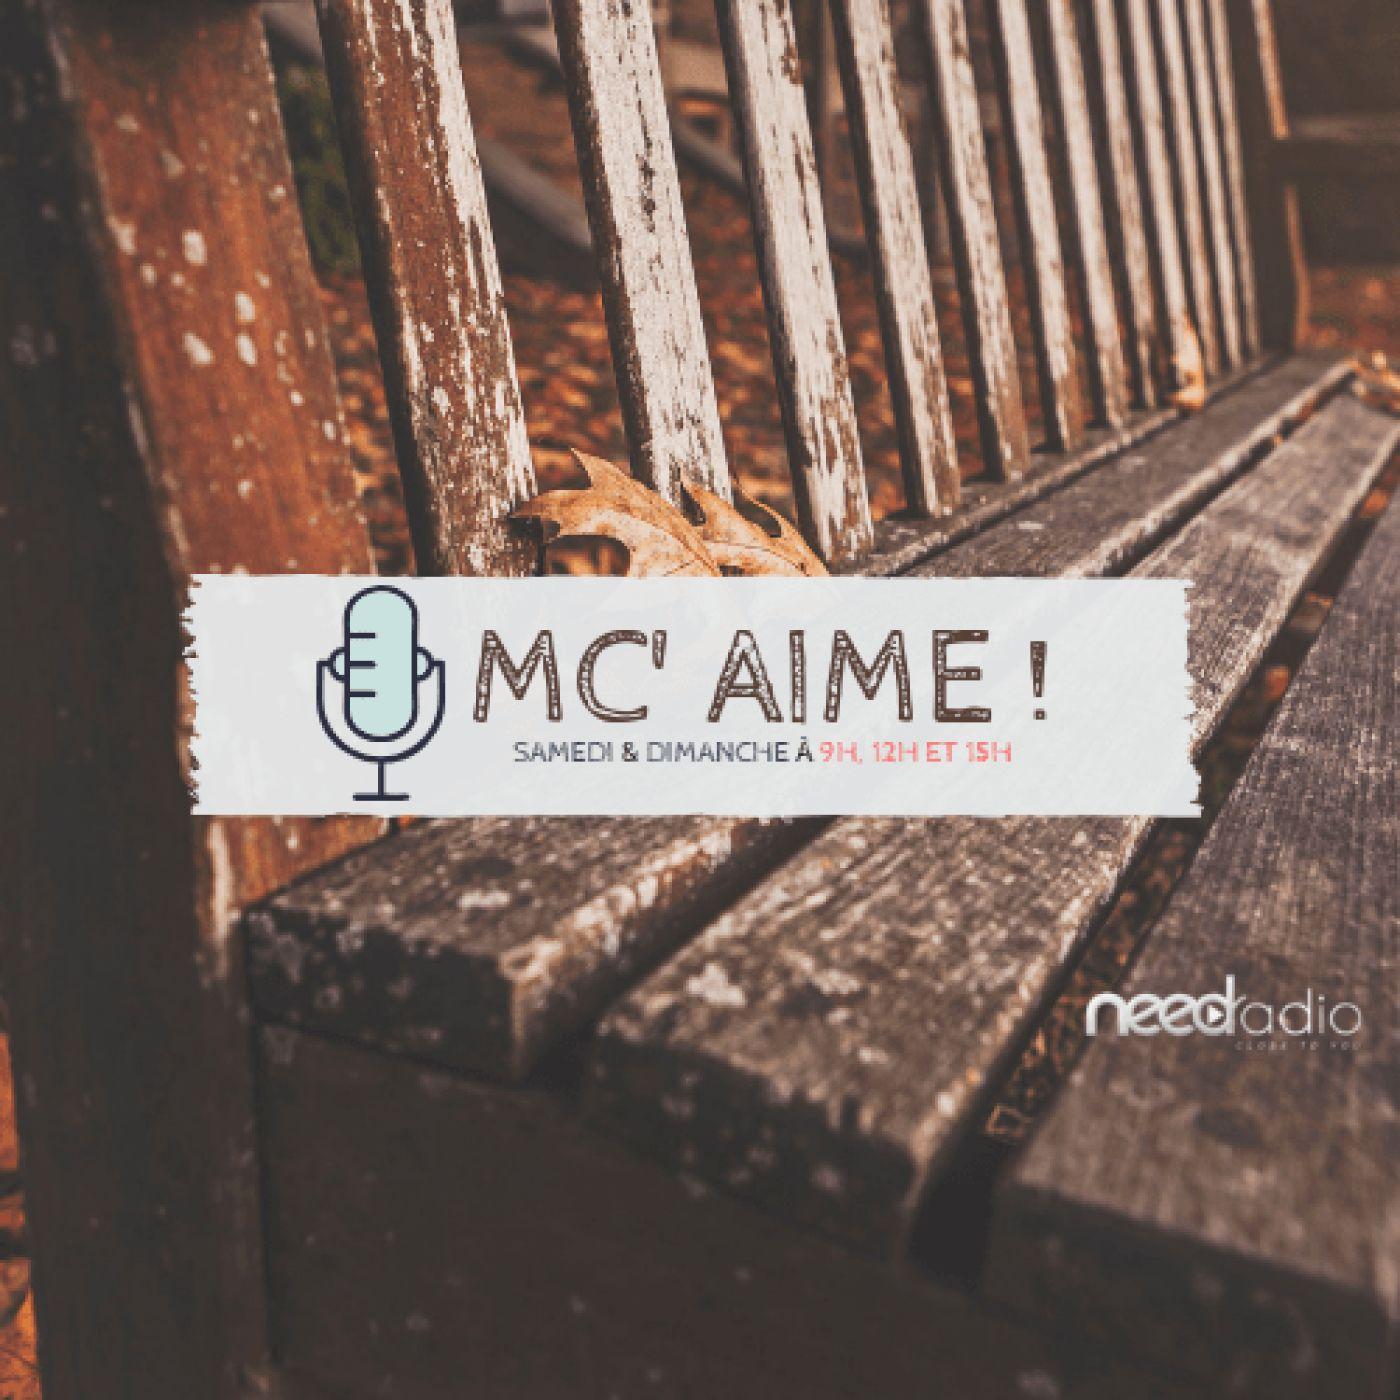 MC' Aime - Goût de France (GOODFRANCE.COM) (10/03/19)